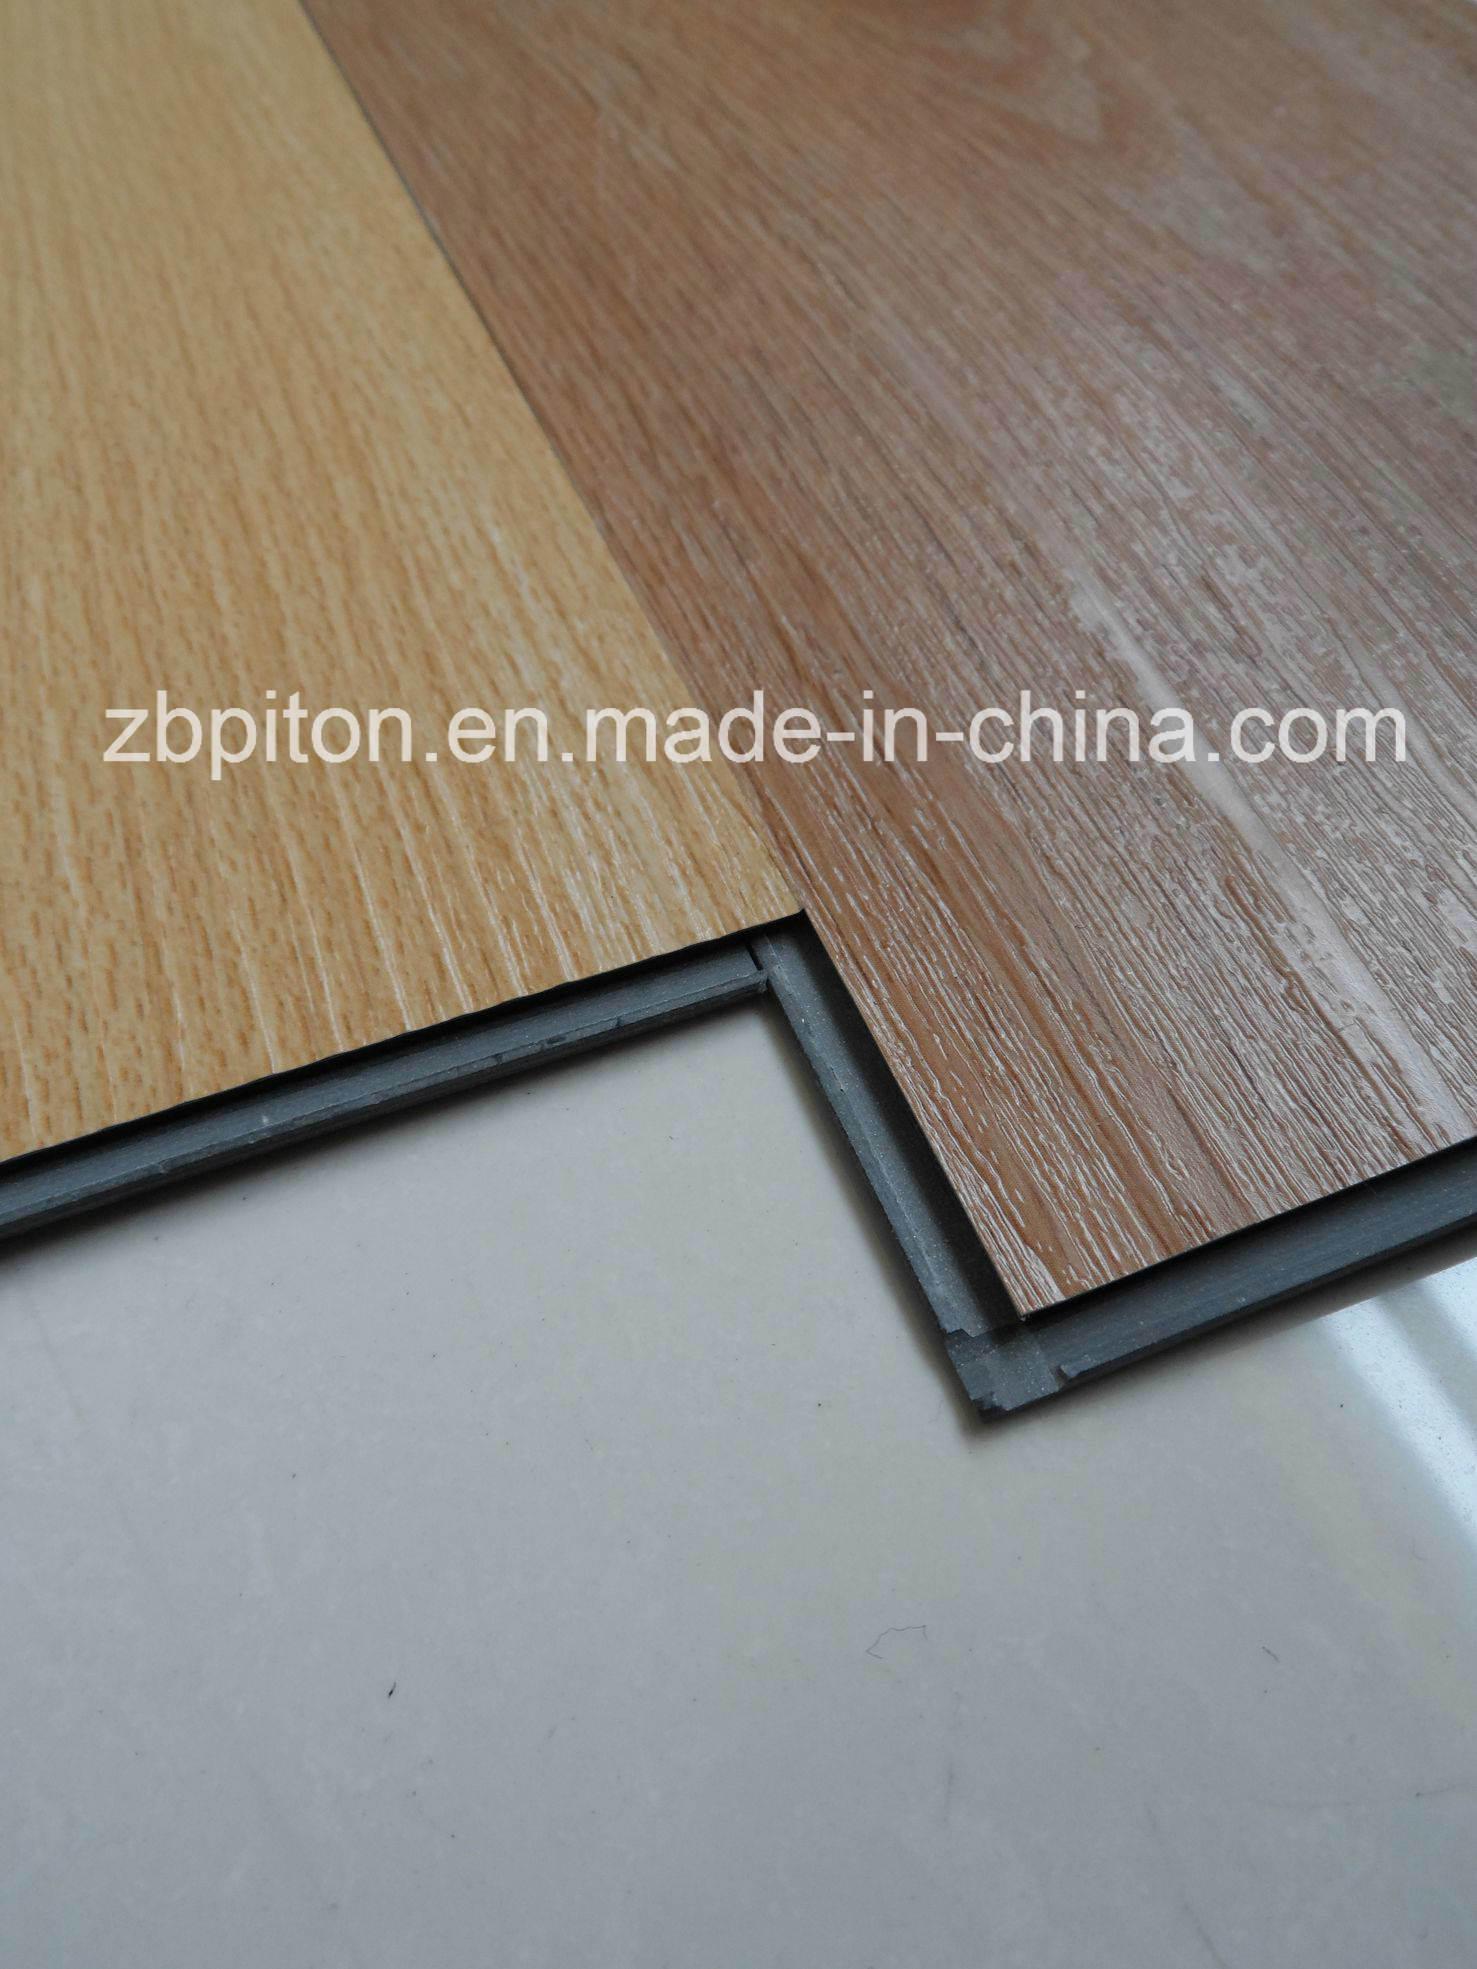 China interlocking pvc vinyl flooring tile pvc plank cng0254n interlocking pvc vinyl flooring tile pvc plank cng0254n dailygadgetfo Gallery